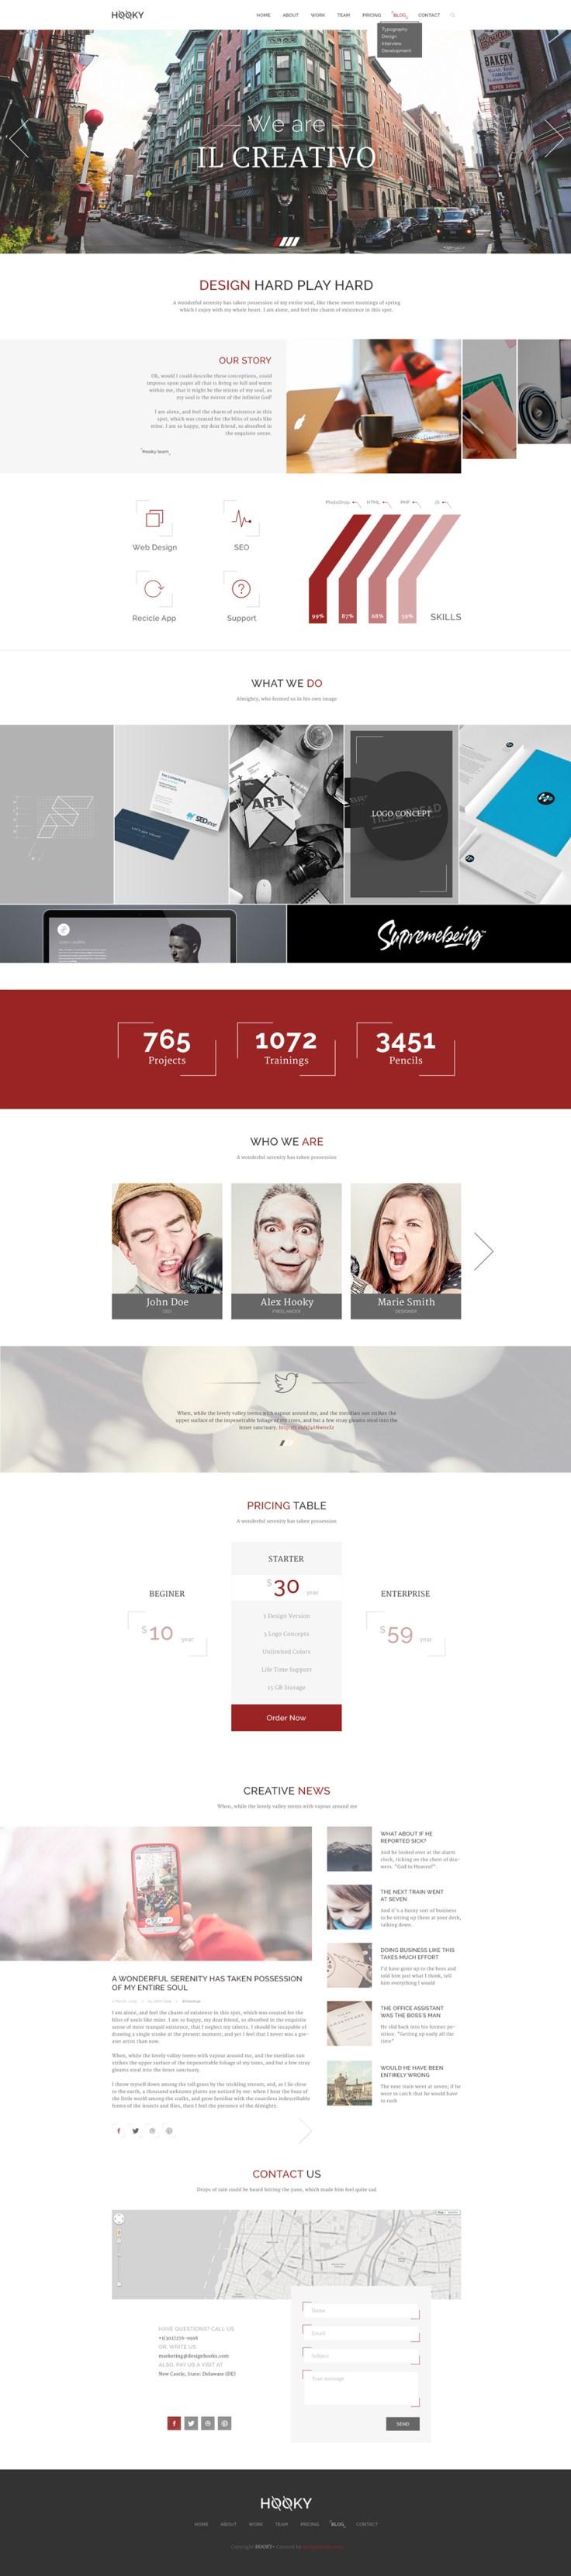 Hooky – Creative One Page Web Template PSD